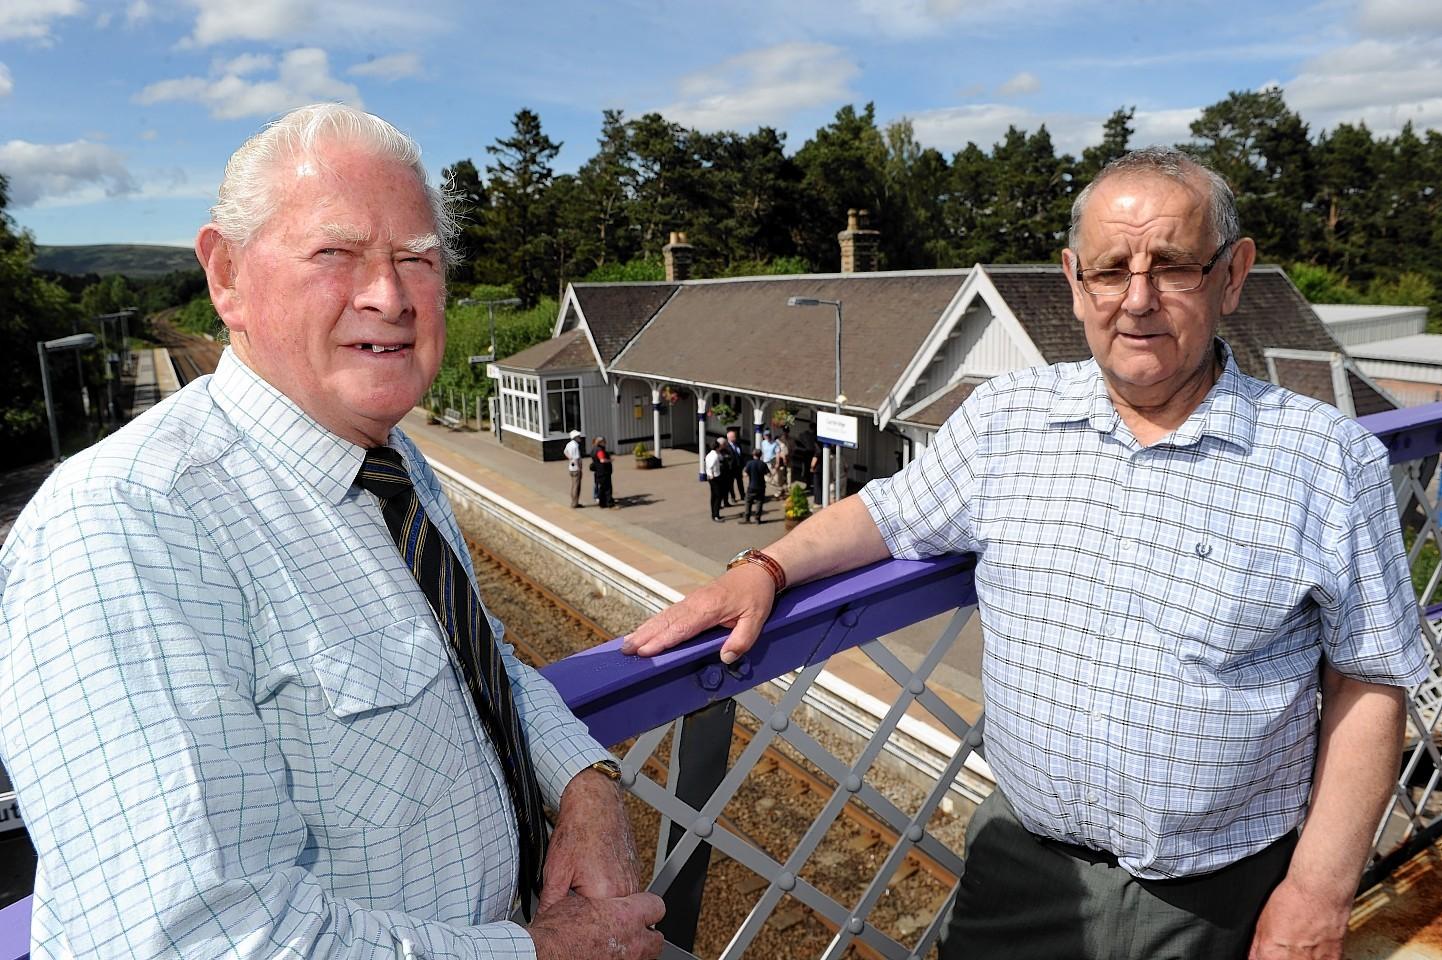 David Ritchie and Iain Dunbar